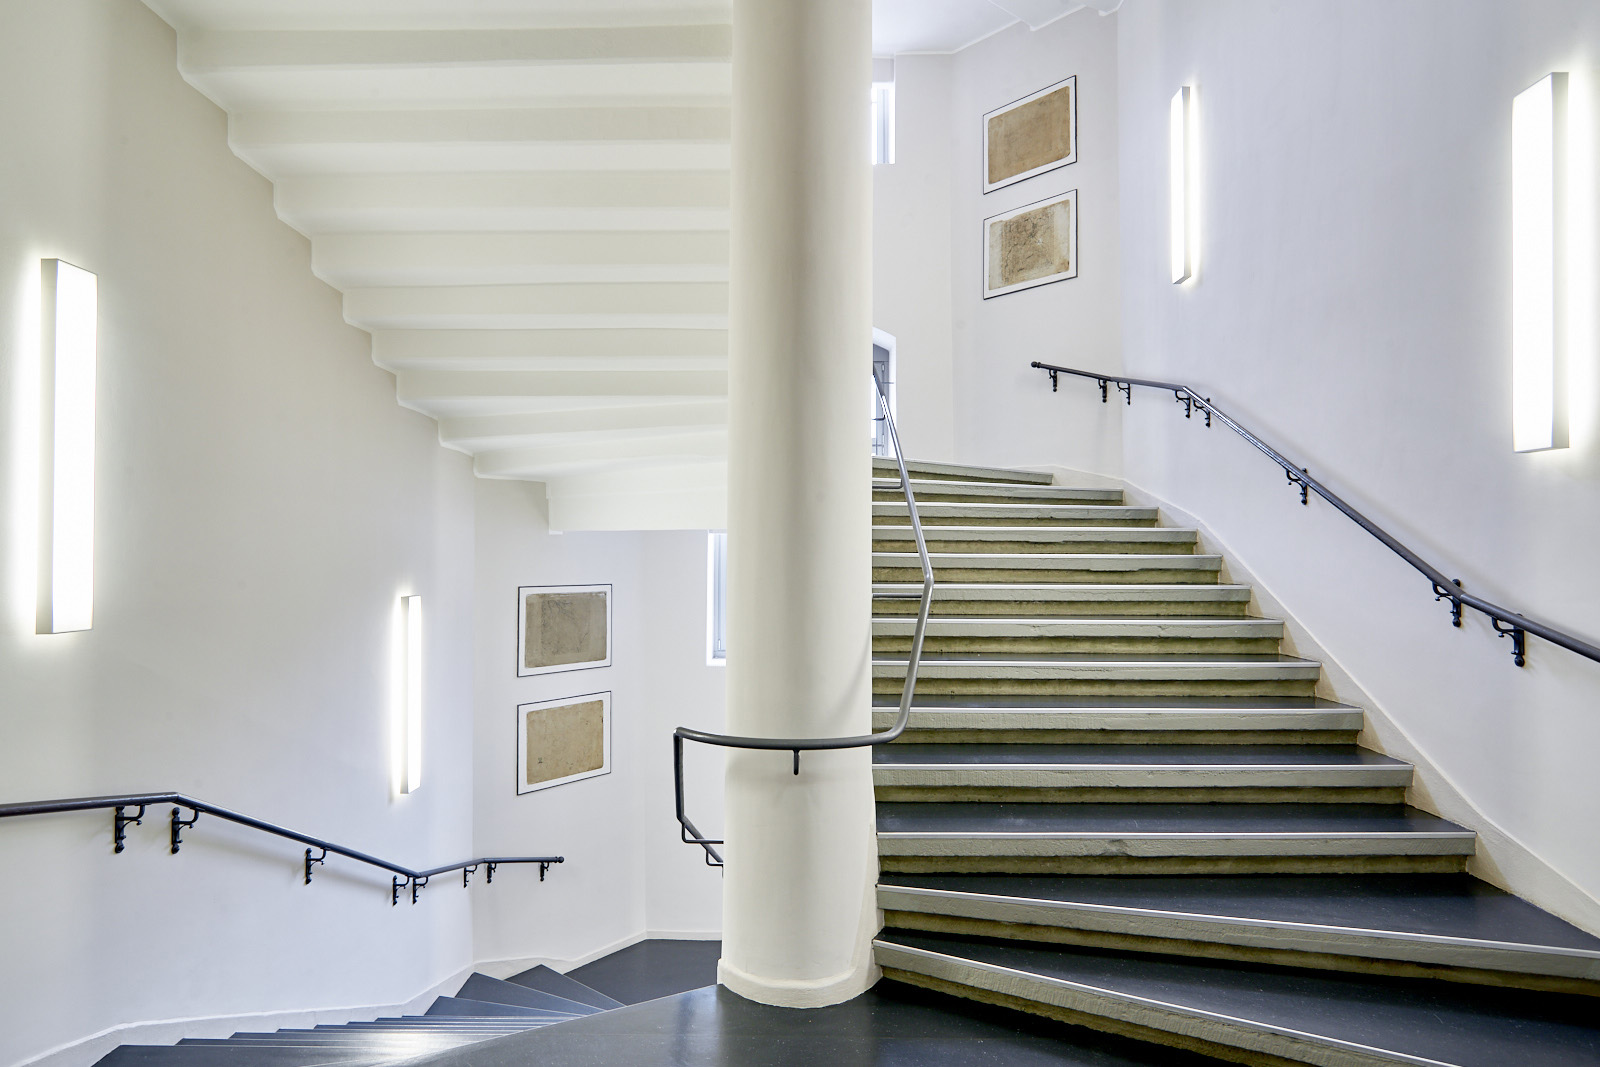 GEOSN_treppenaufgang_rl